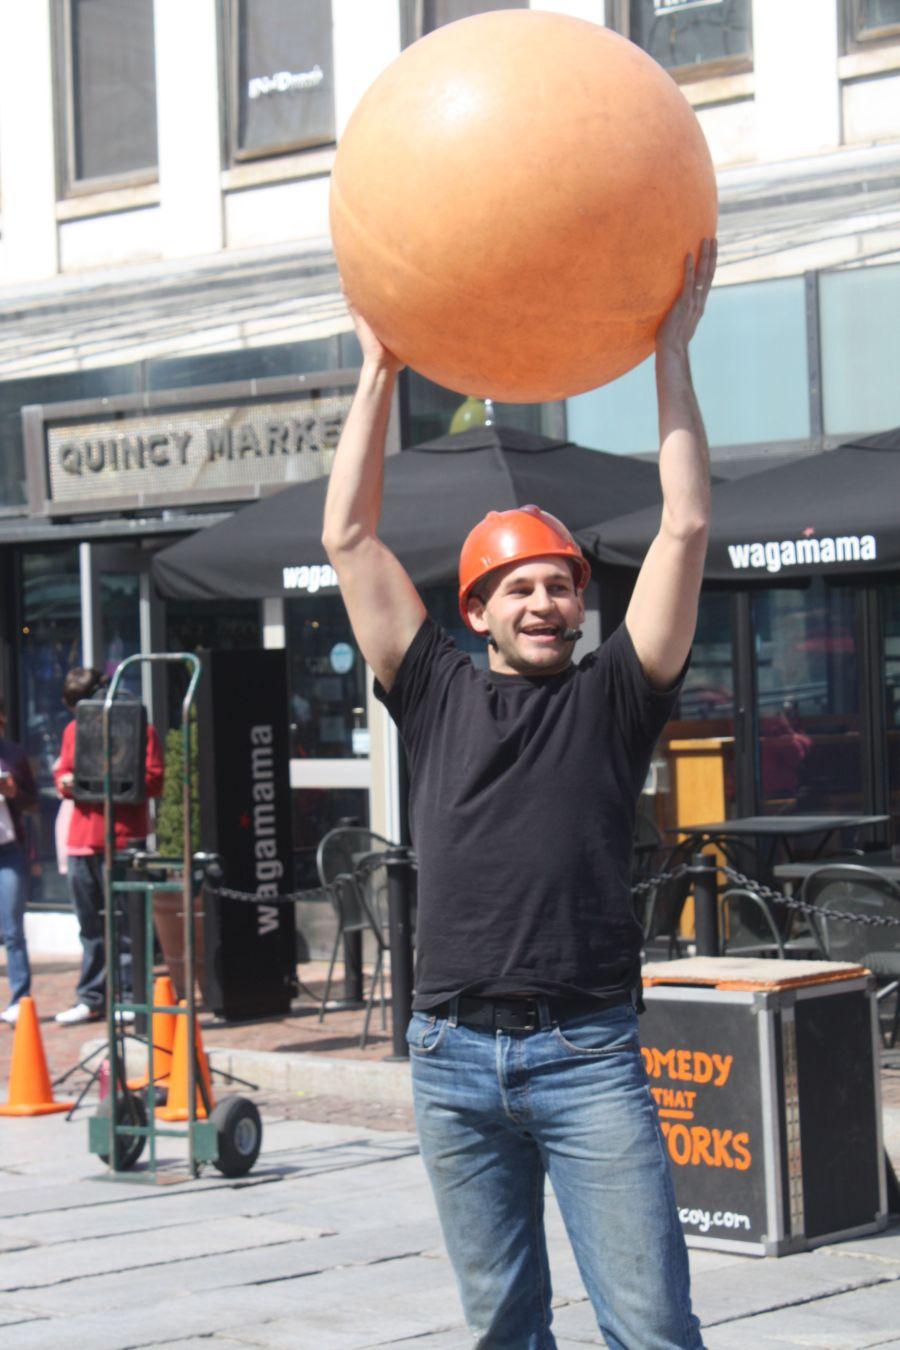 boston faneuil hall brett mccoy real mccoy comedy that works street performer 4